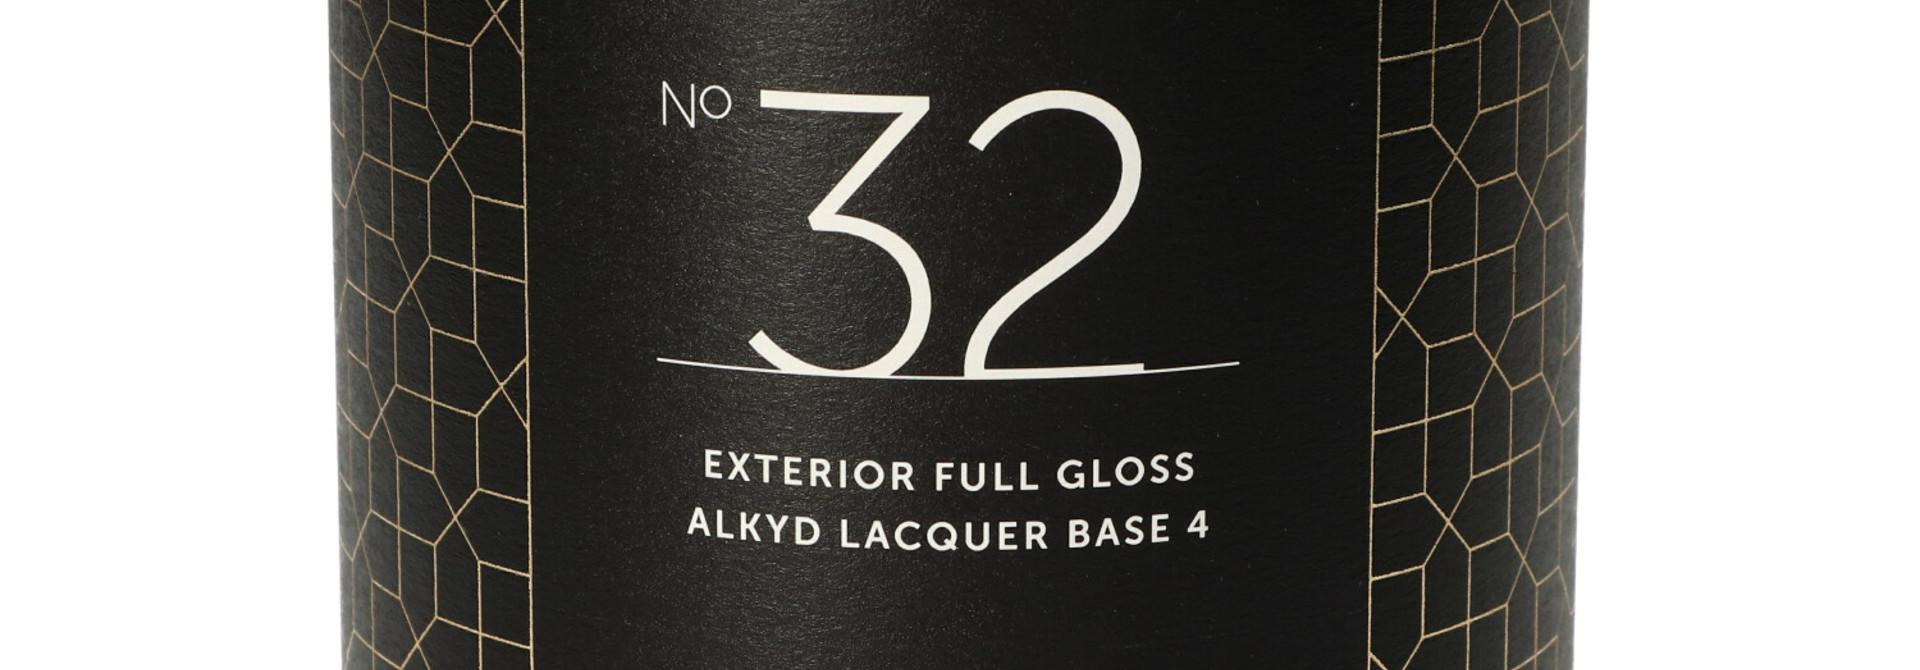 No. 32 EXTERIOR FULL GLOSS alkyd - 1L